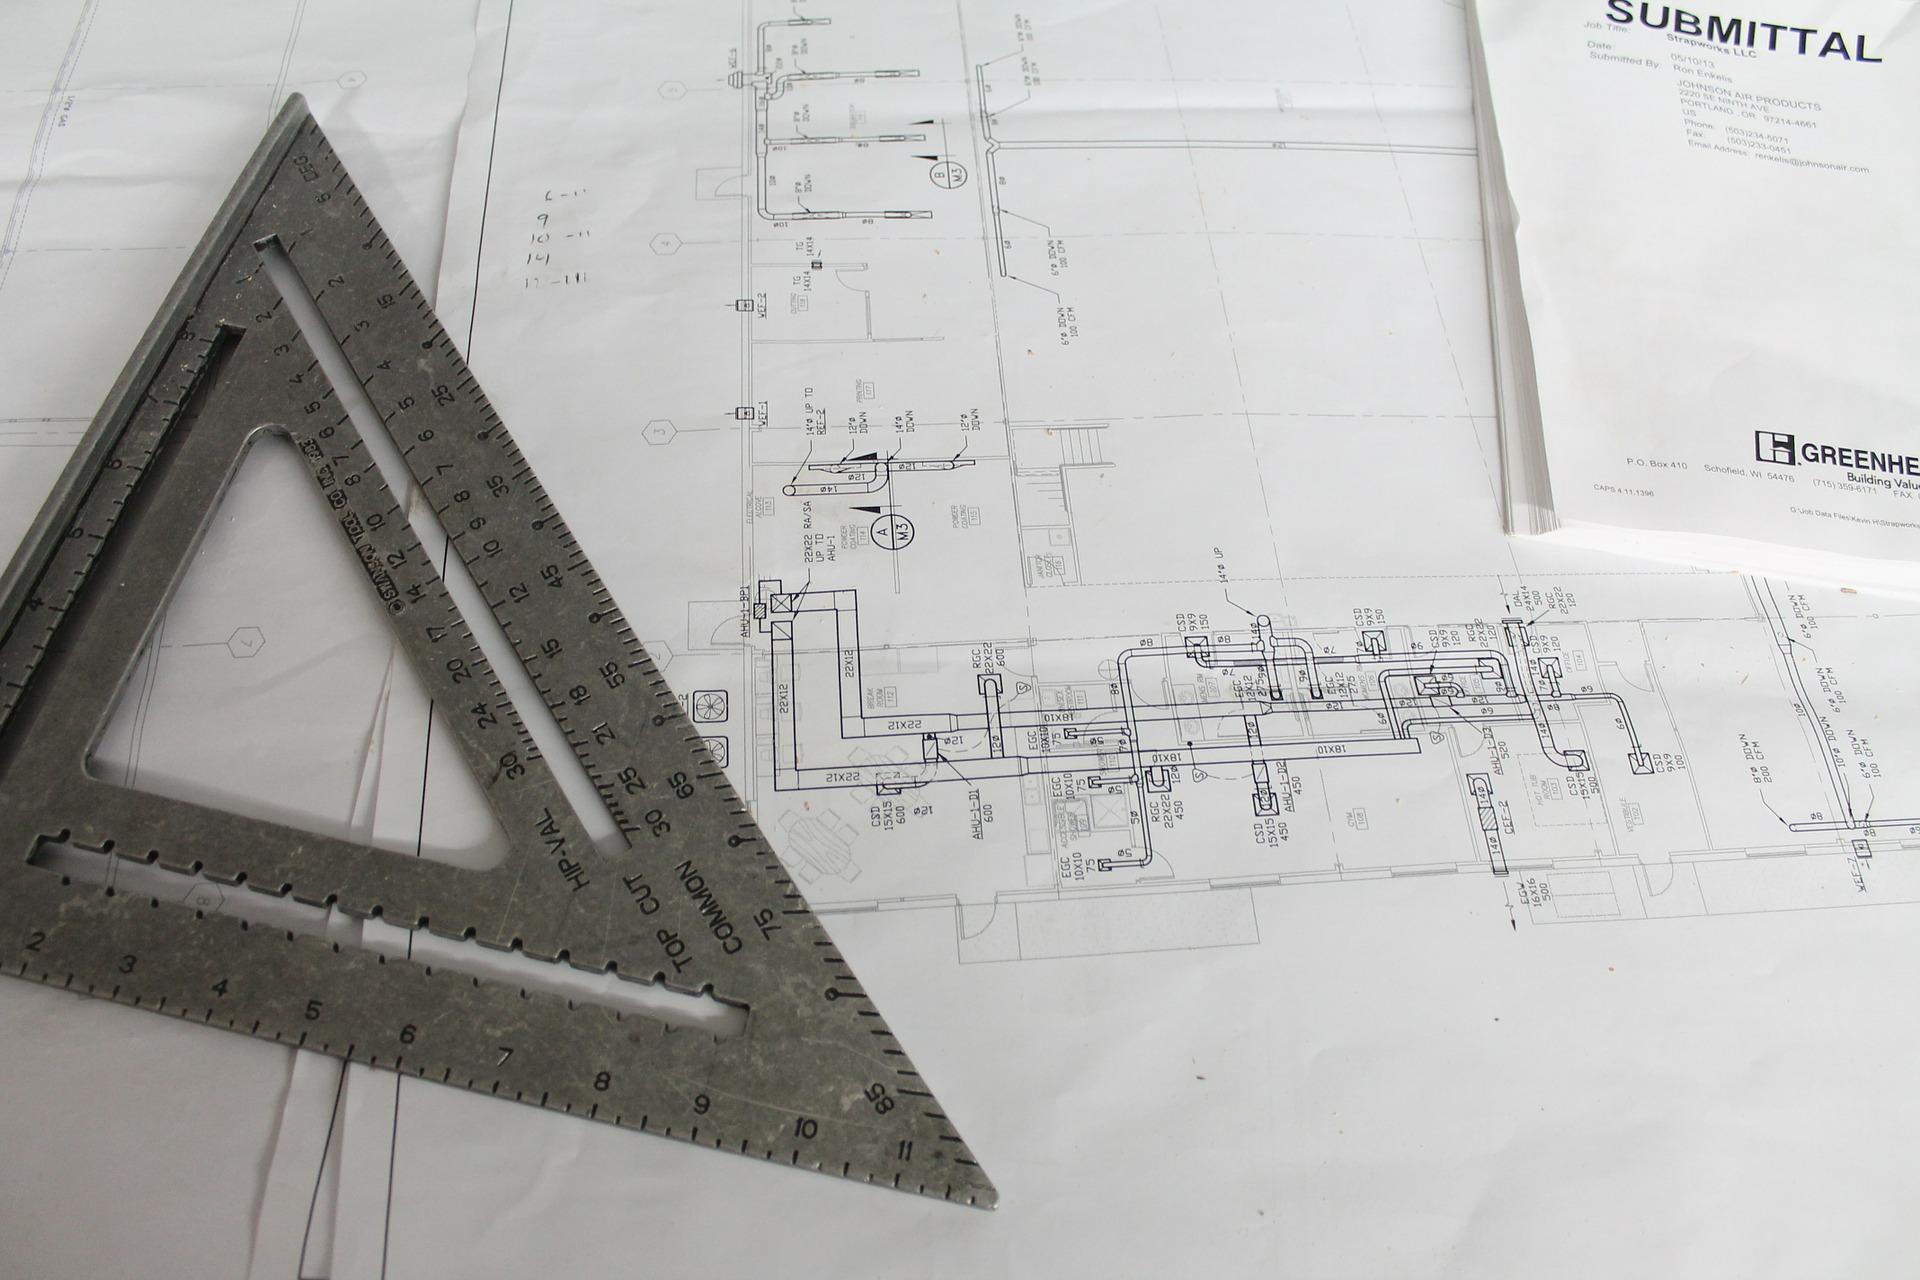 20170512 - warehouse layout.jpg